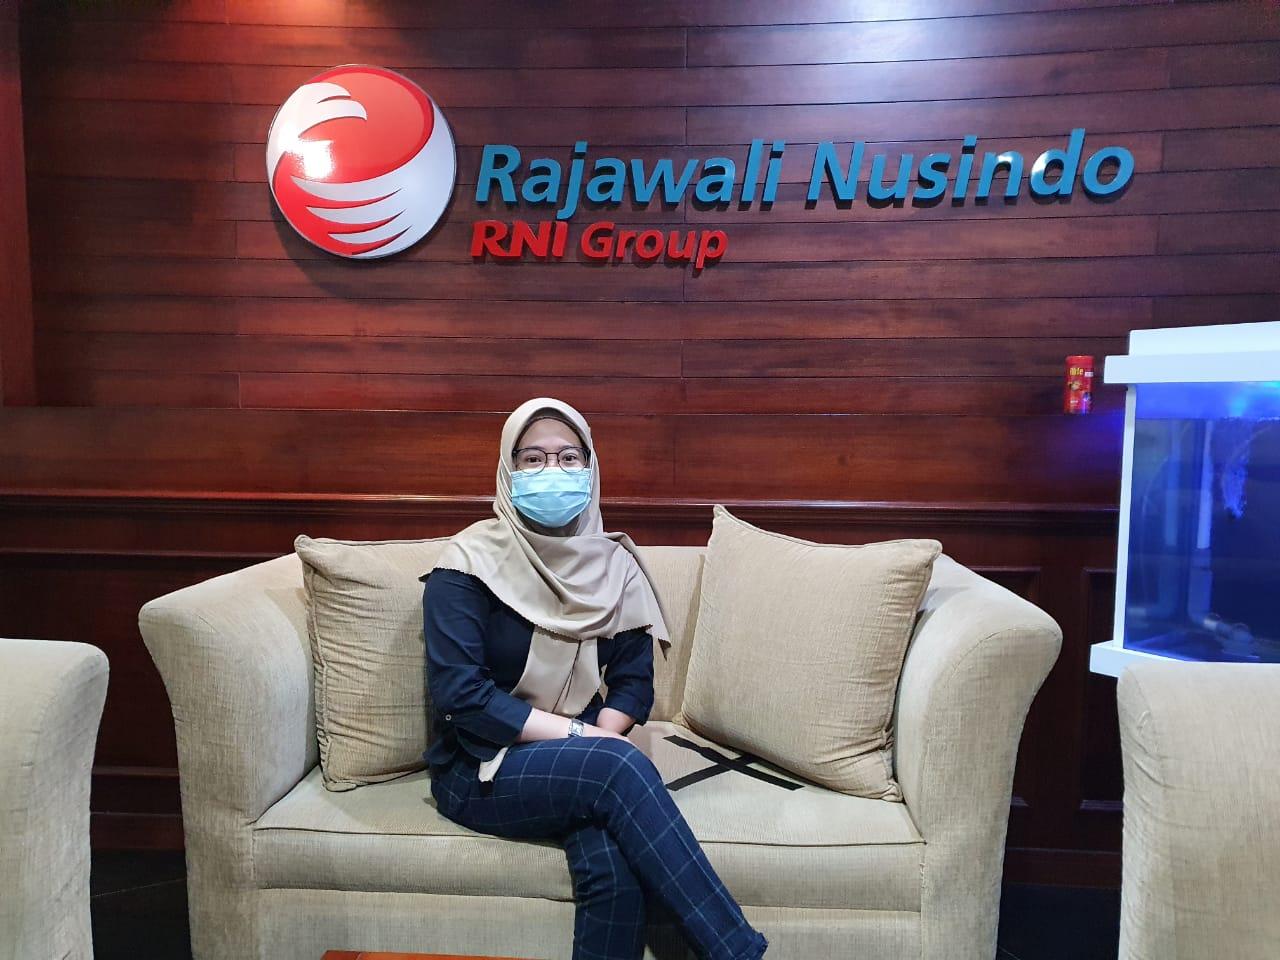 Rajawali Nusindo Tunjukkan Komitmen dengan Rangkul Tenaga Kerja Difabel